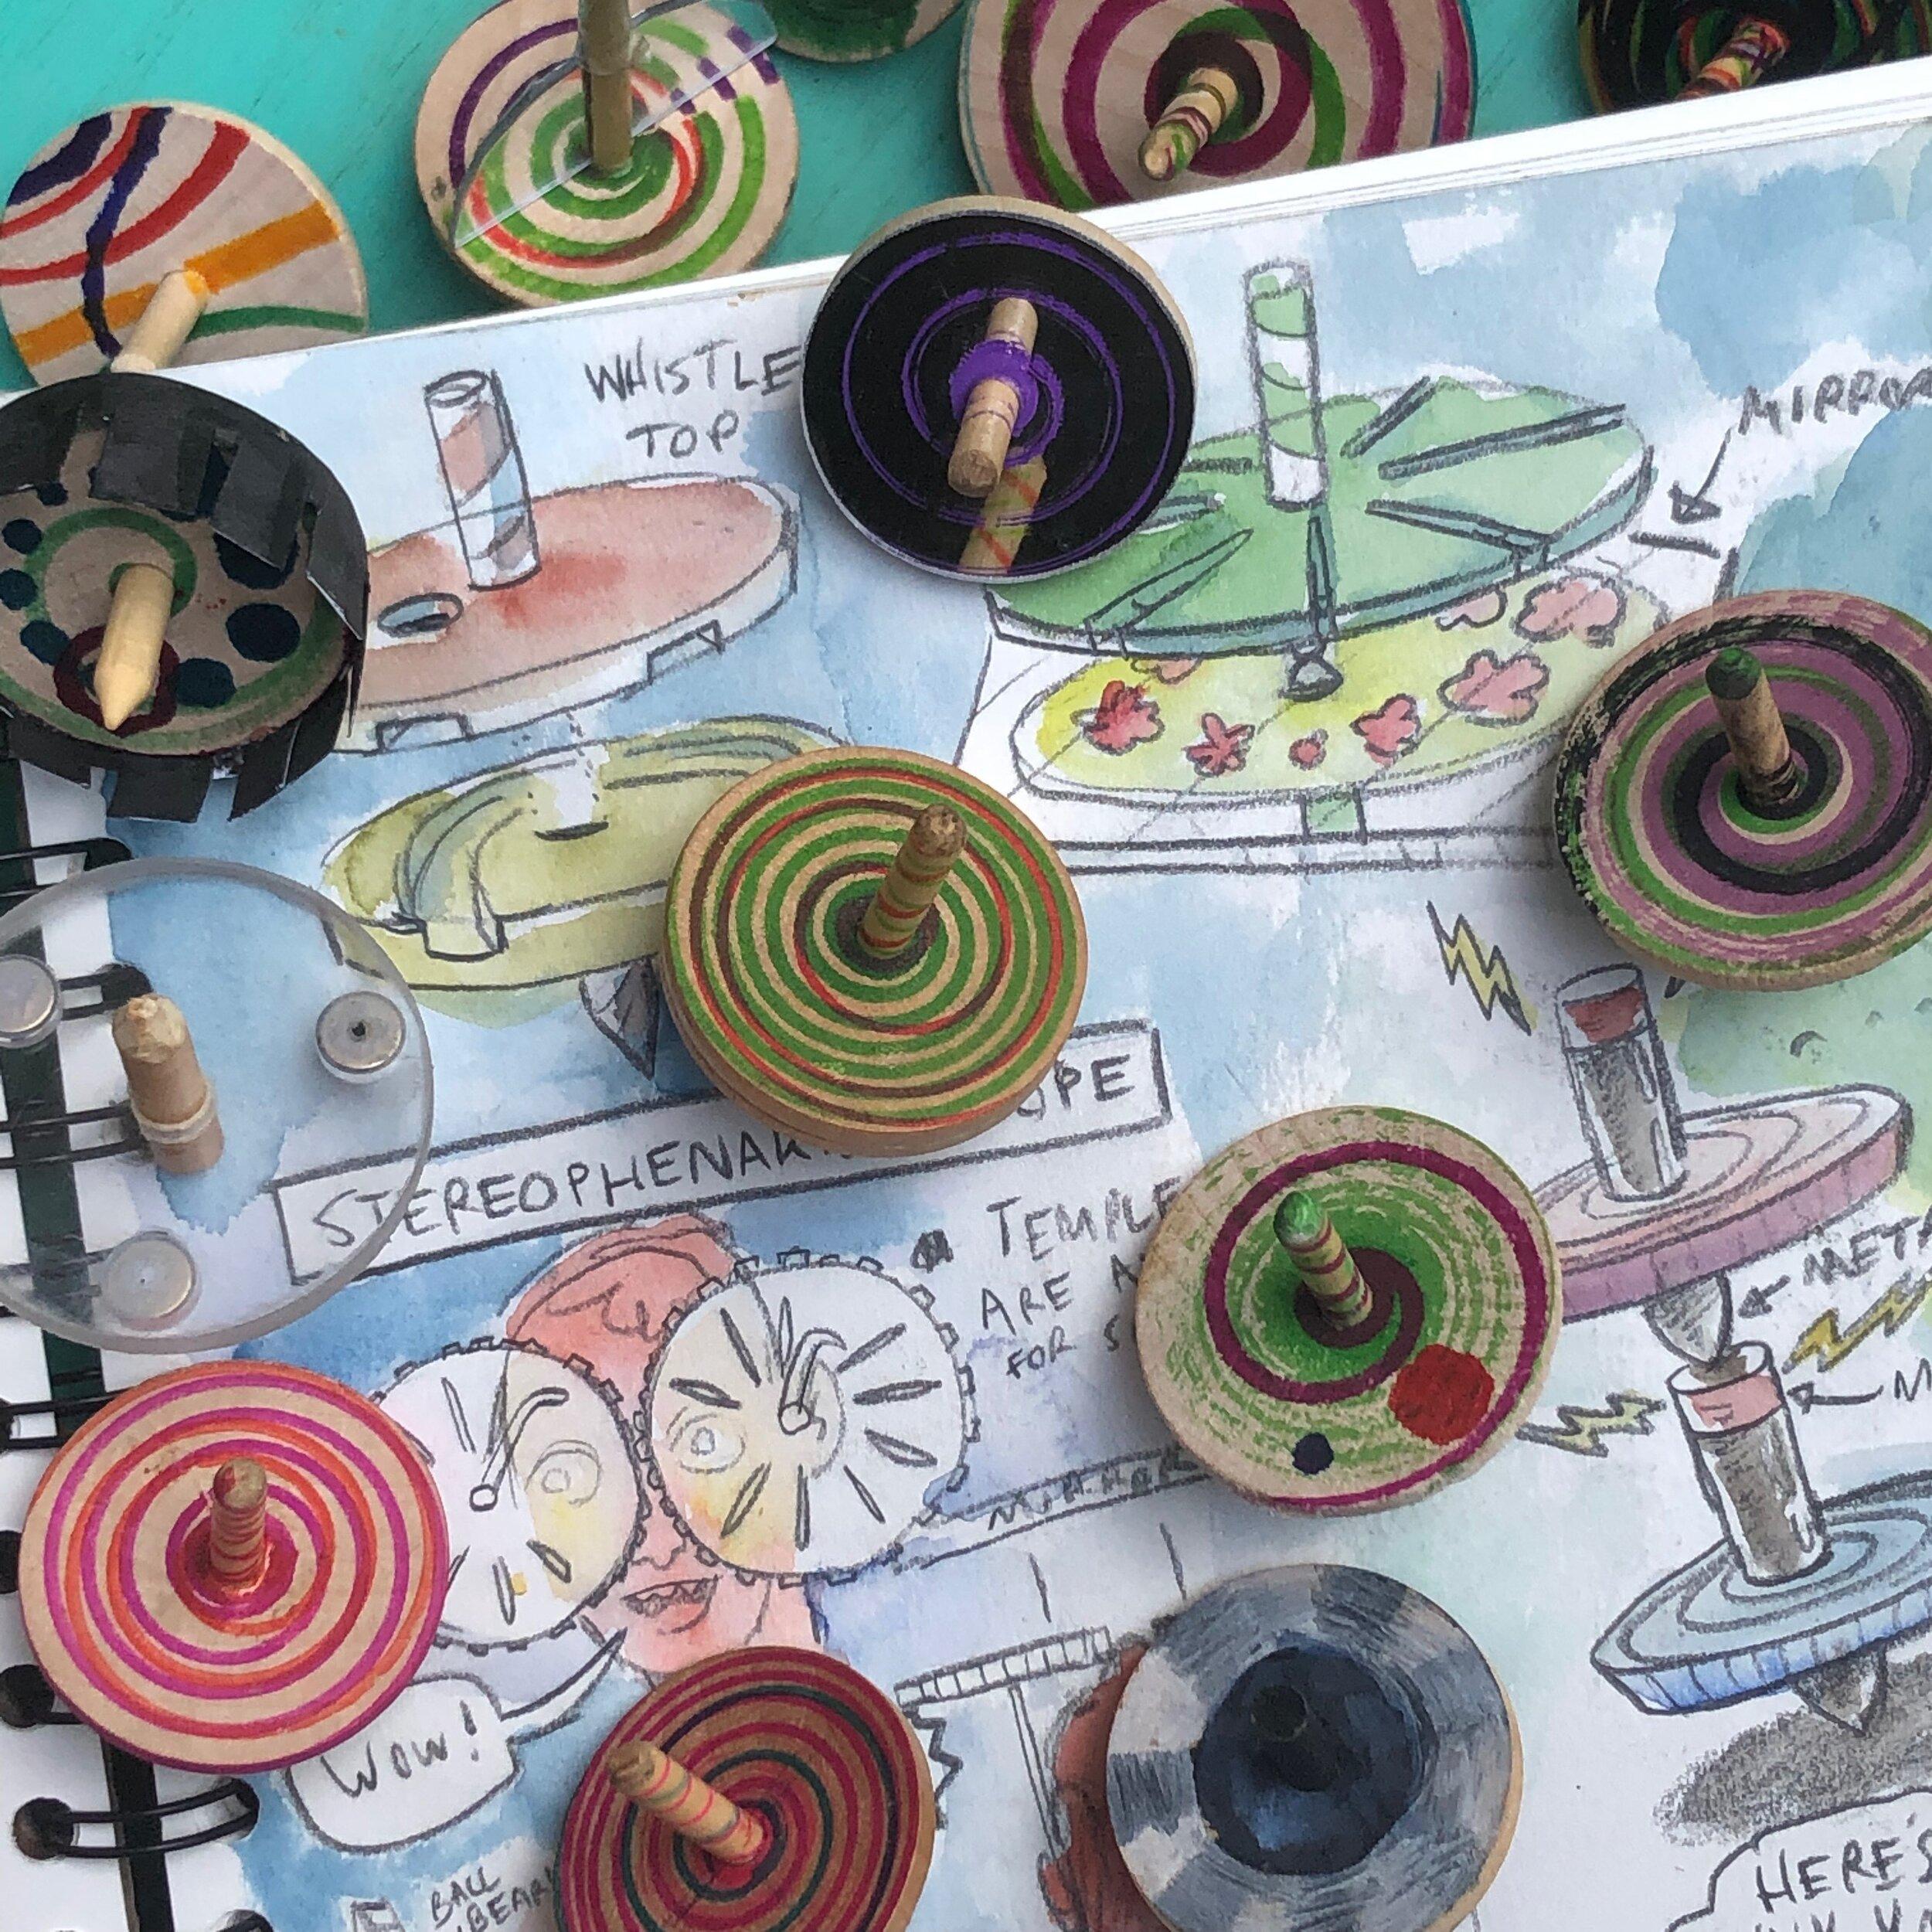 Spinning top DIY prototypes